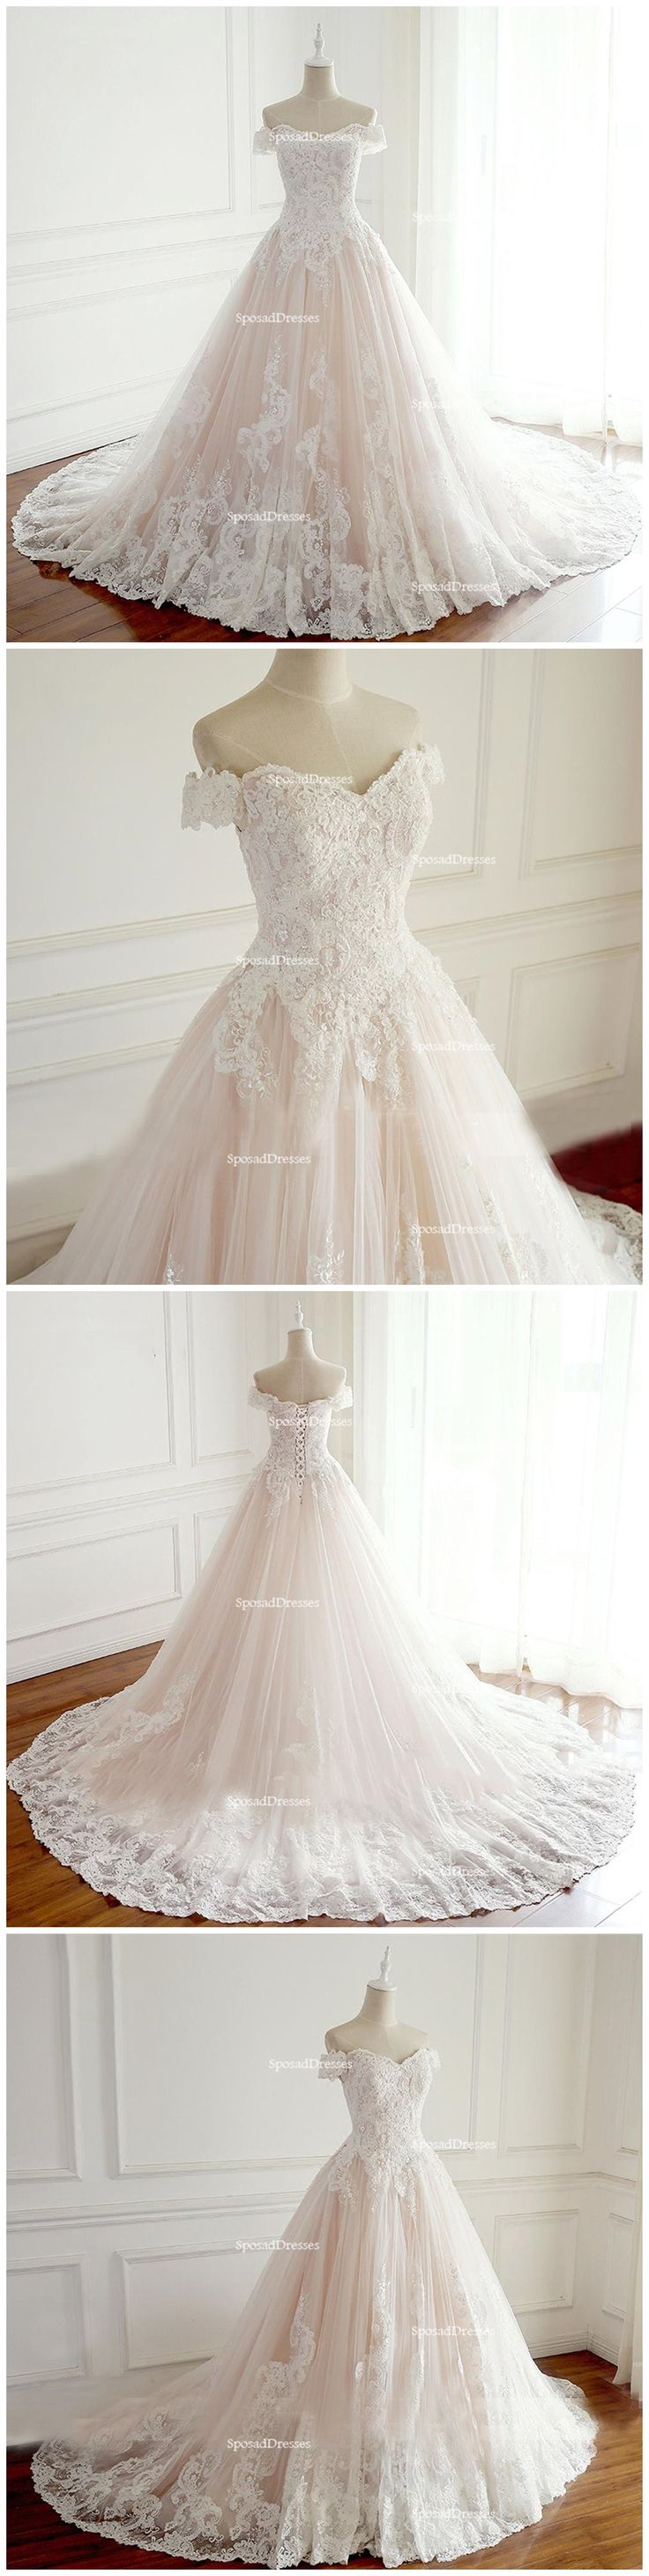 Best womenus fashion images on pinterest cute dresses lace